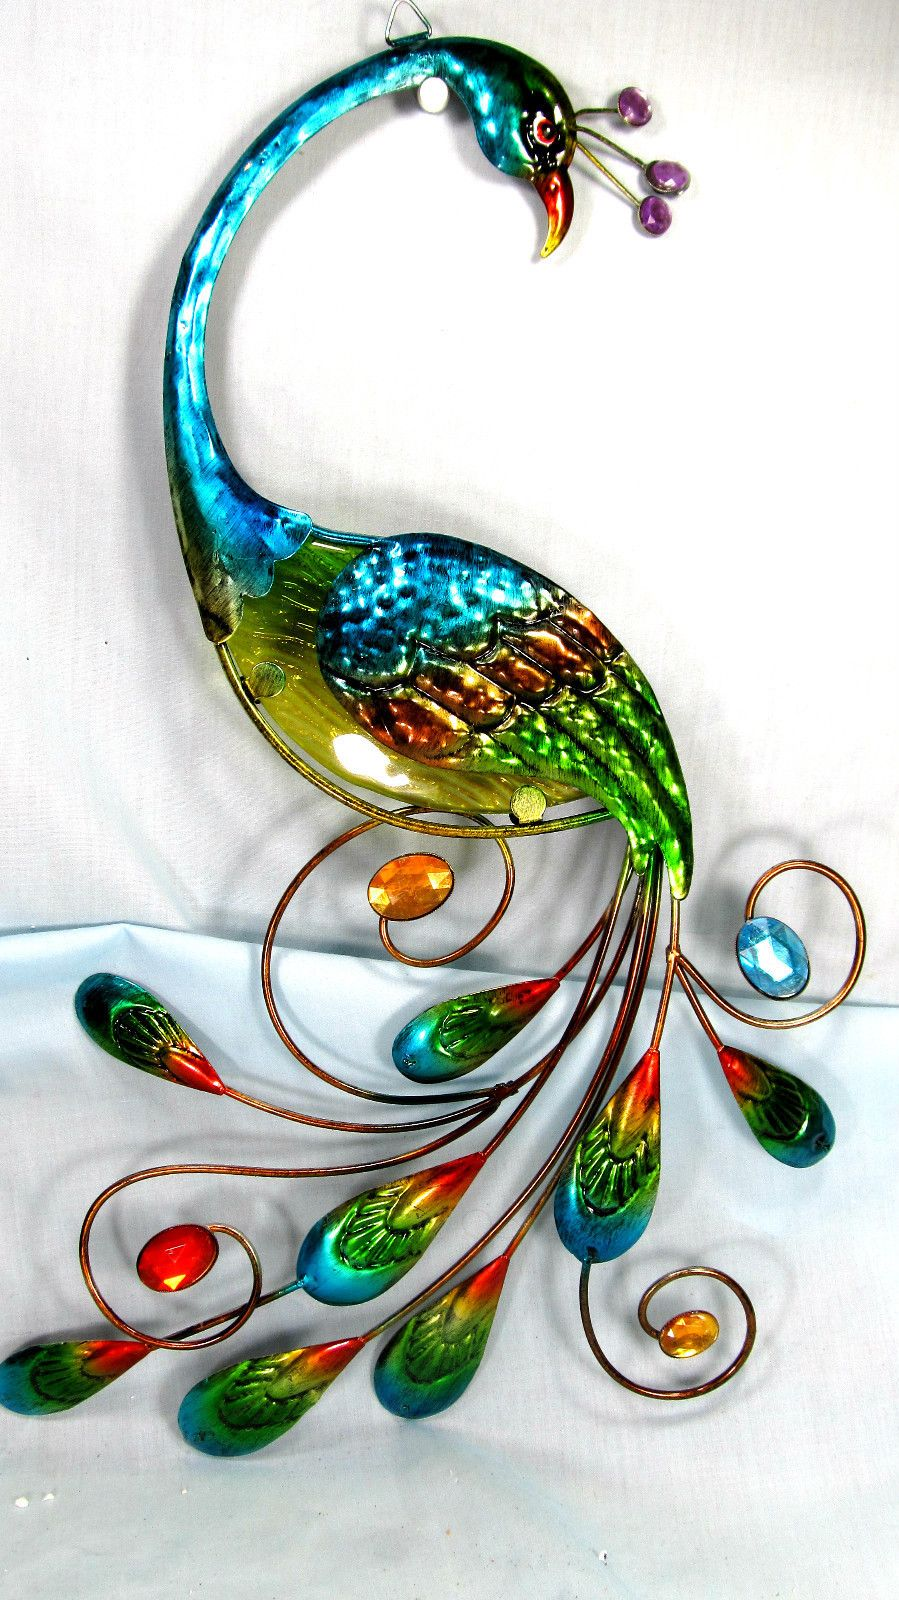 Peacock metal and glass wall hanging art teal home decor bedroom